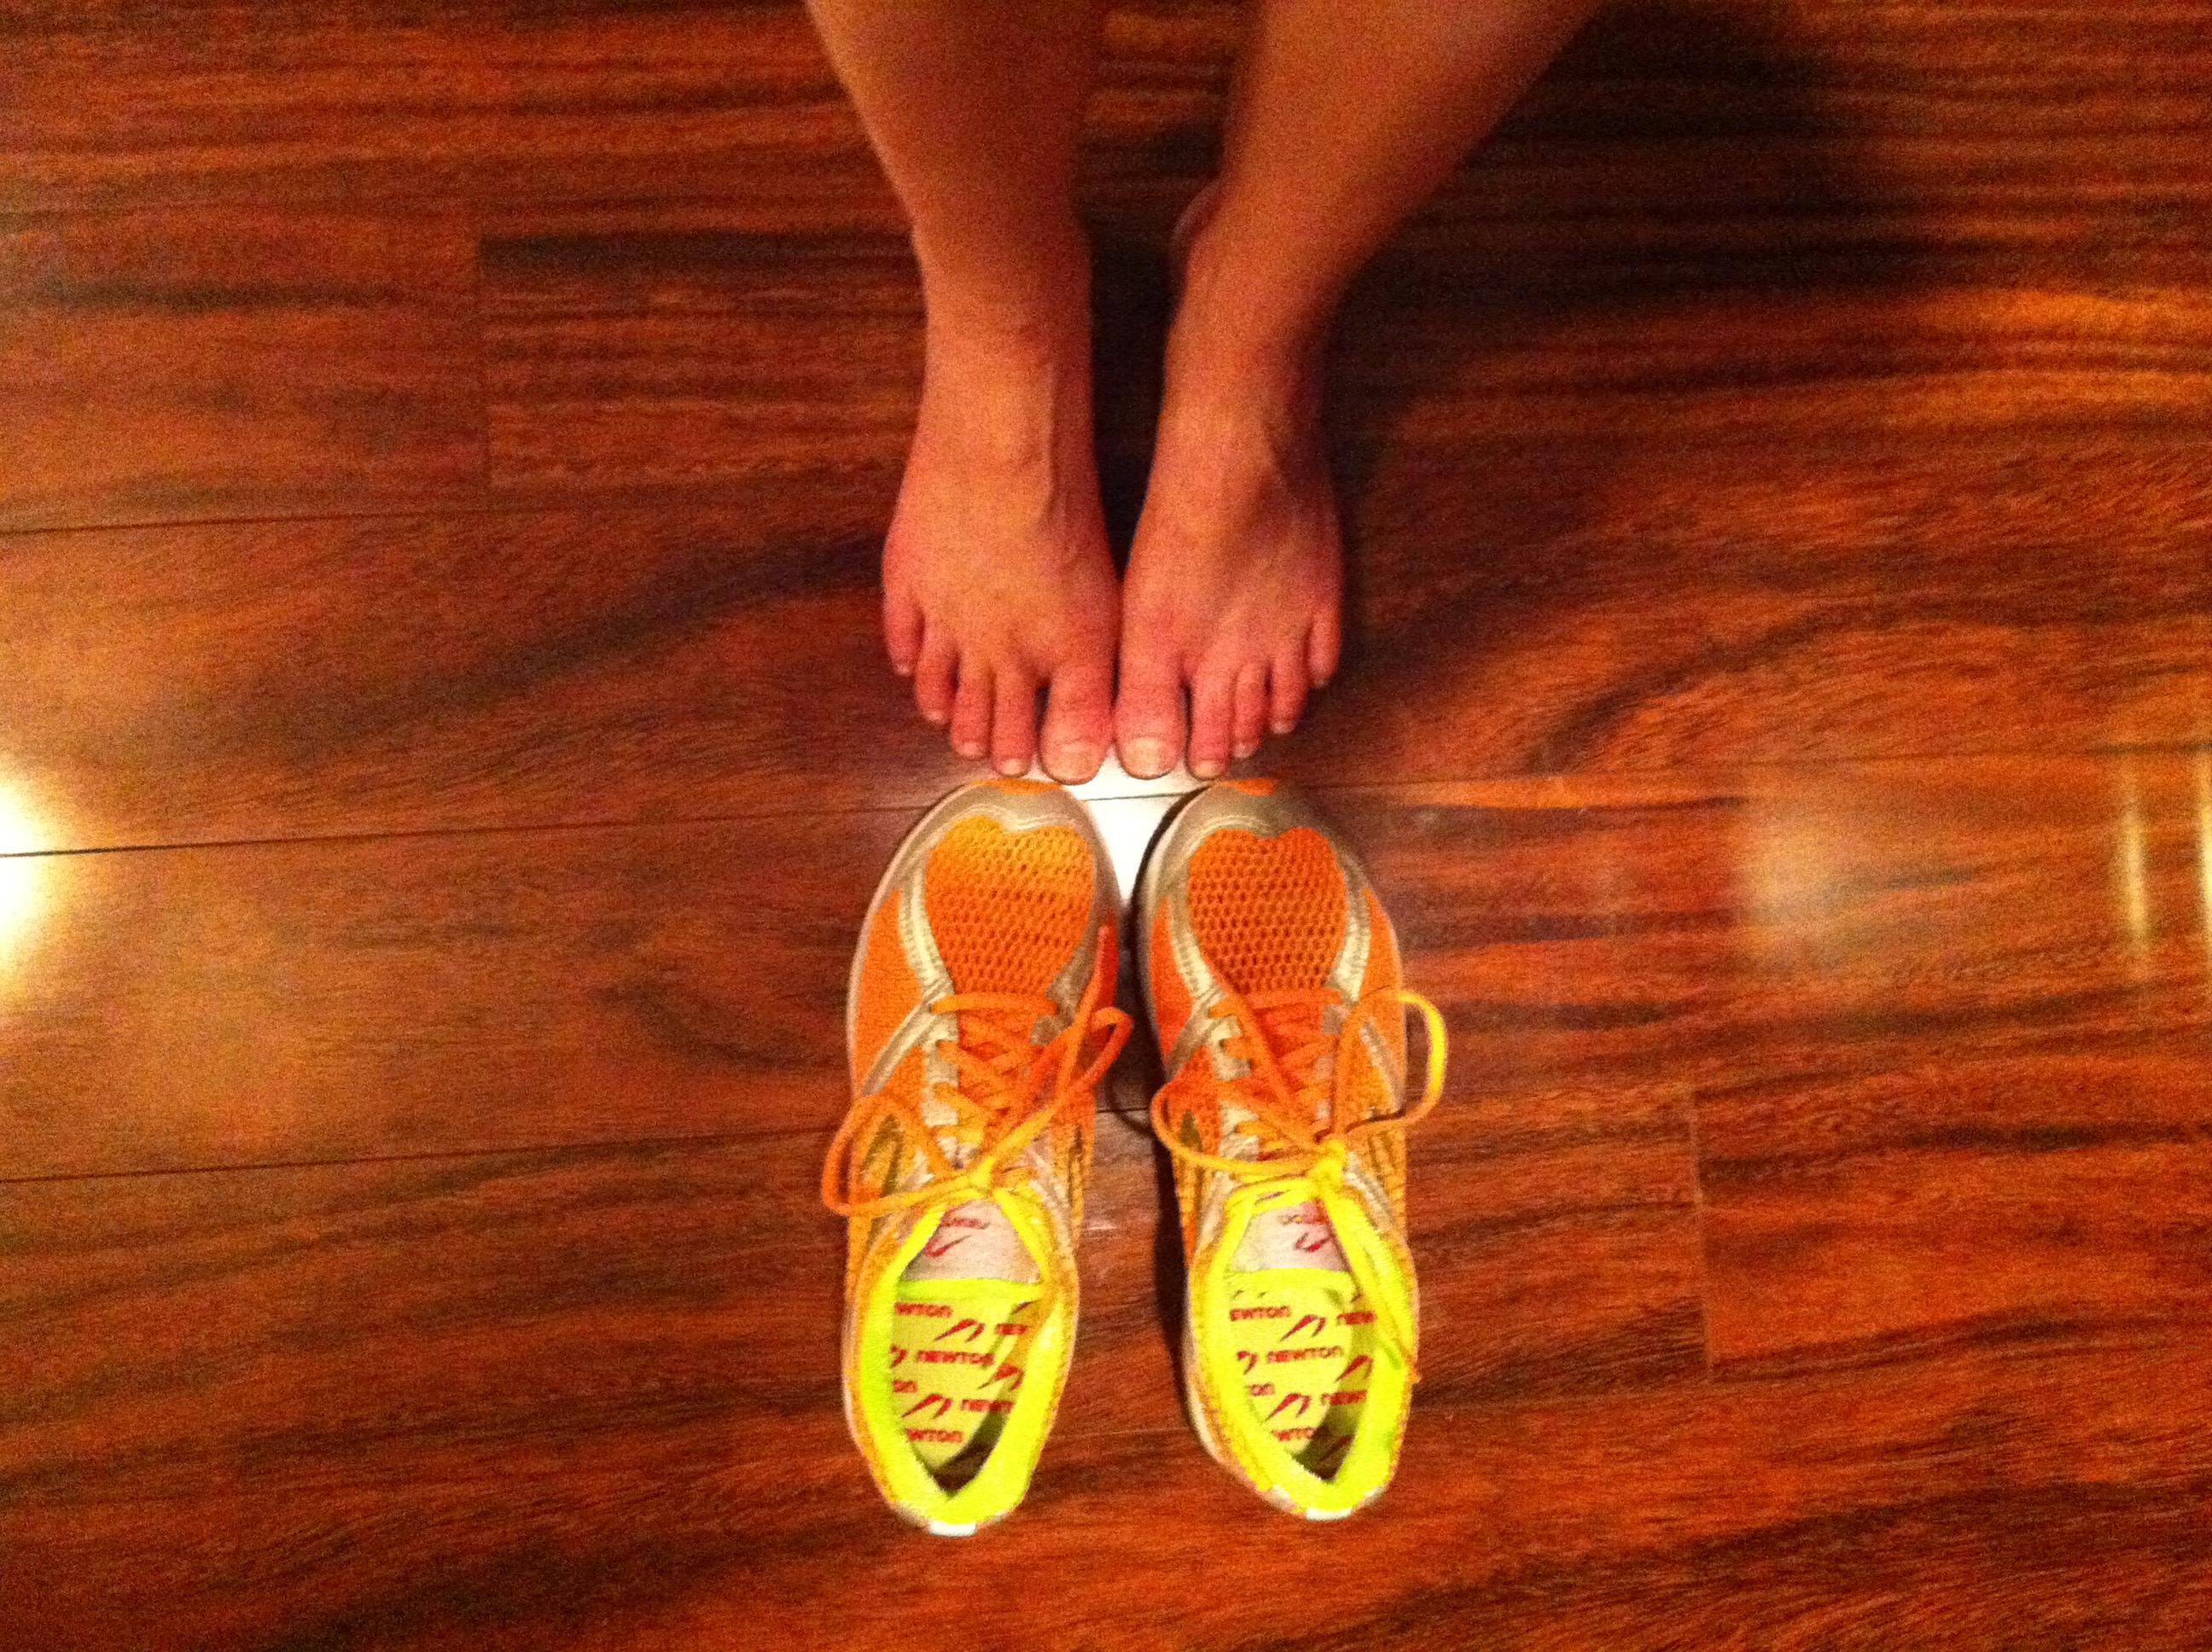 Love me, love my feet.